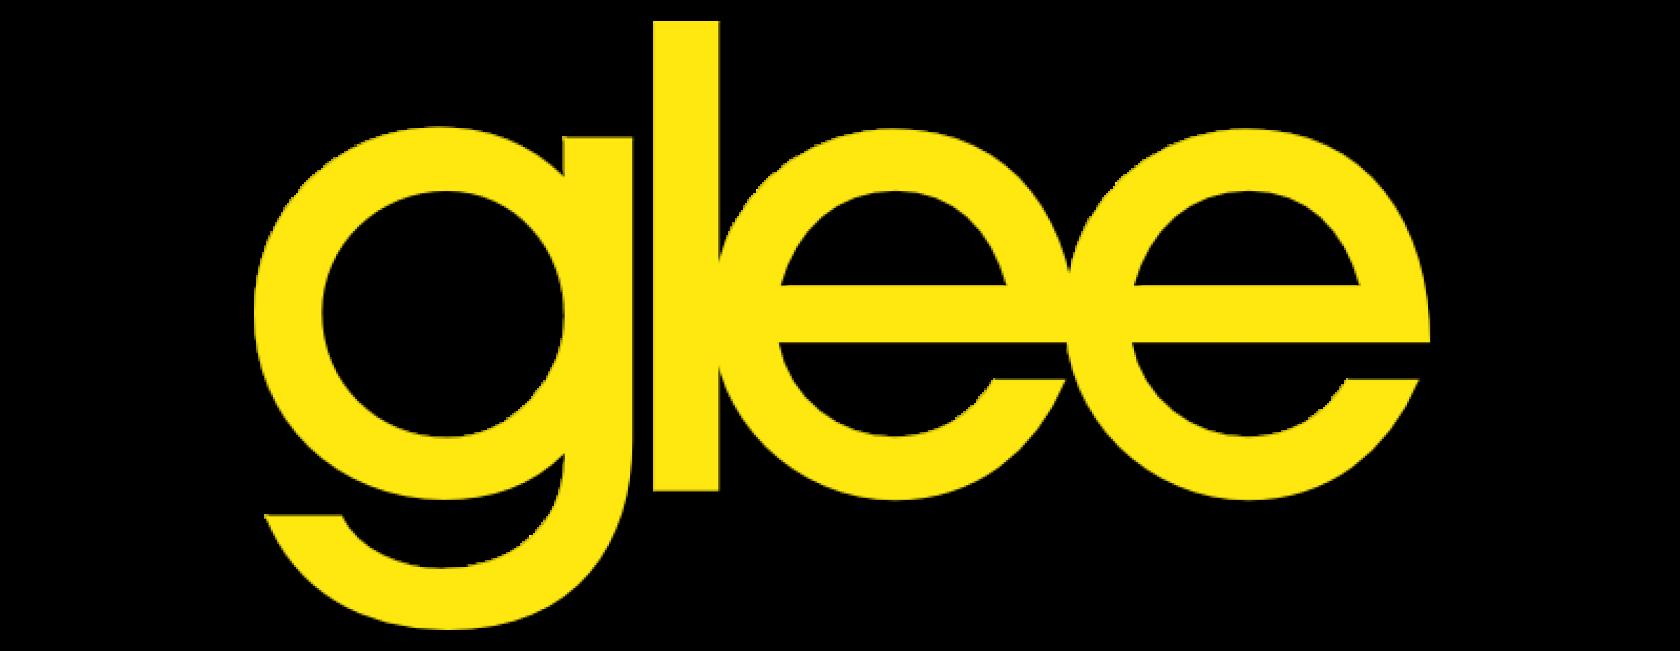 Watch Glee Online | Full Episodes in HD FREE